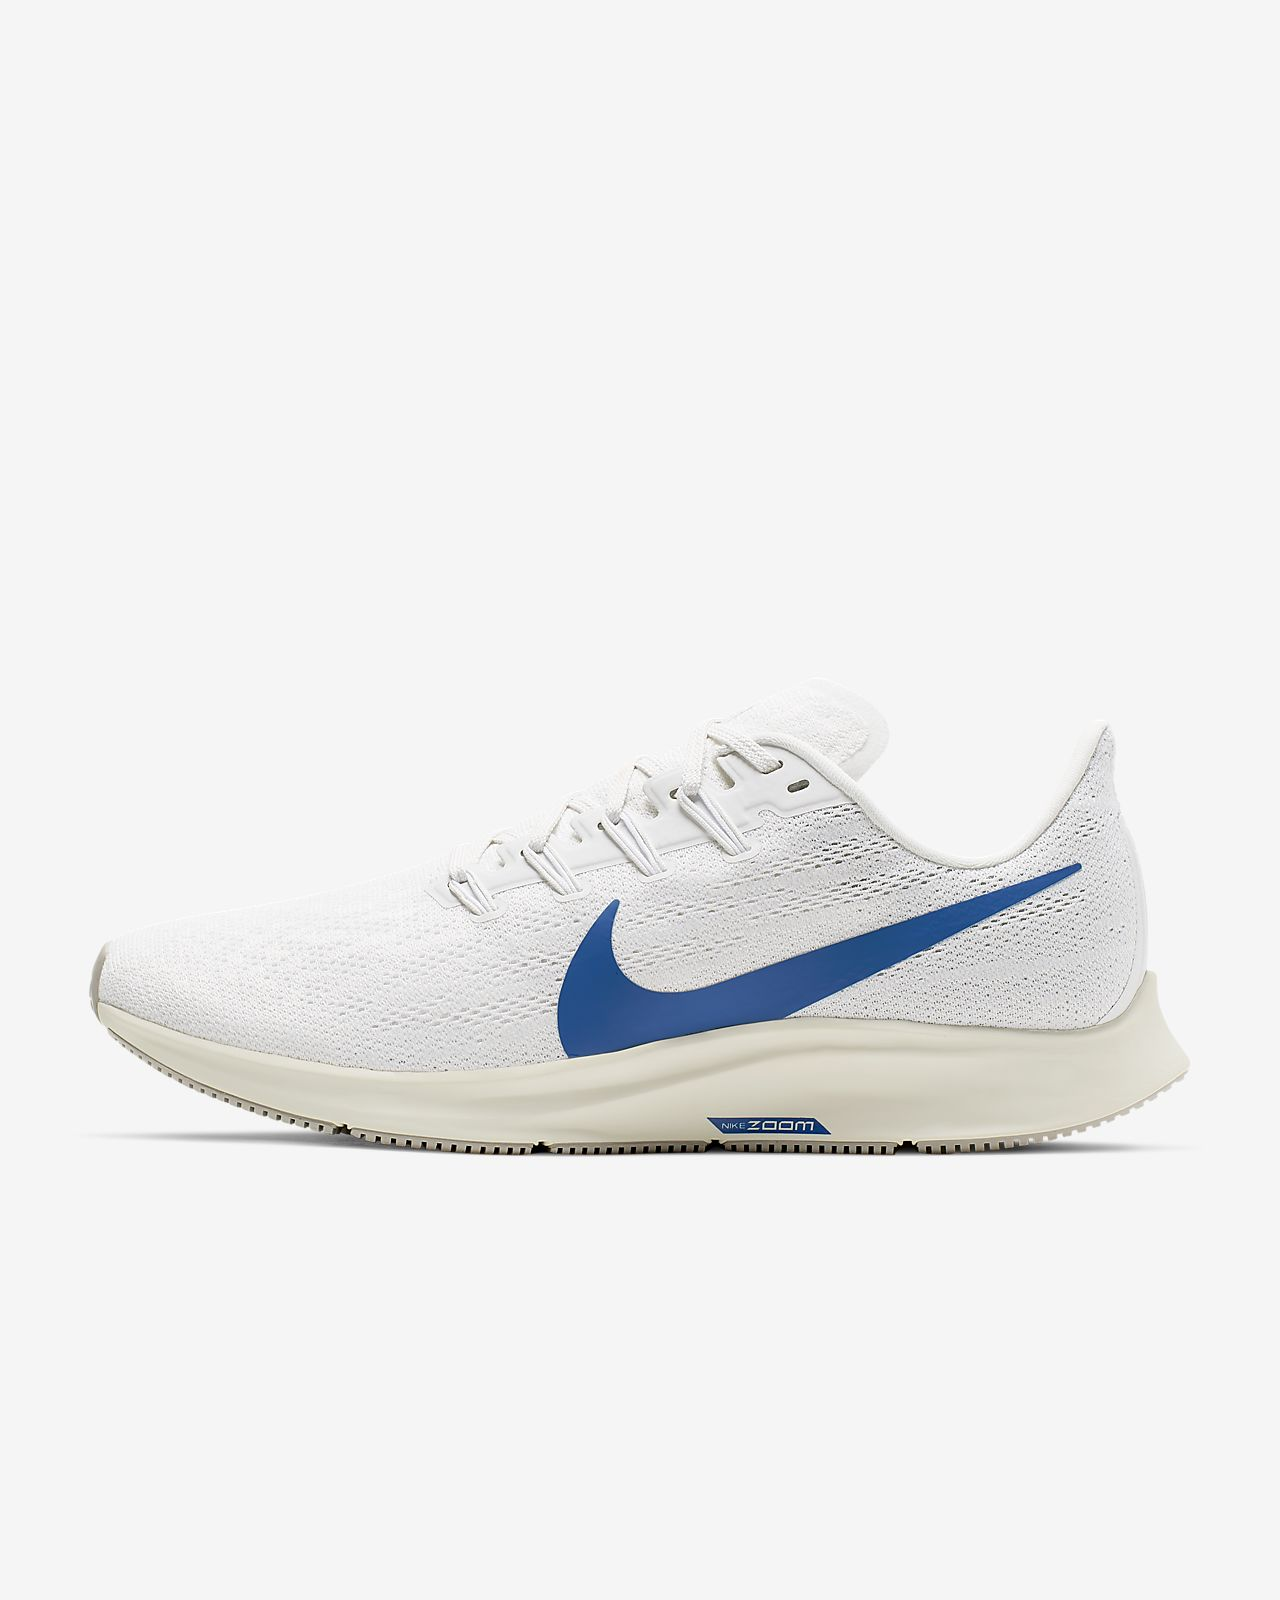 Herren Schuhe Nike Zoom Pegasus 35 turbo Laufschuhe sail